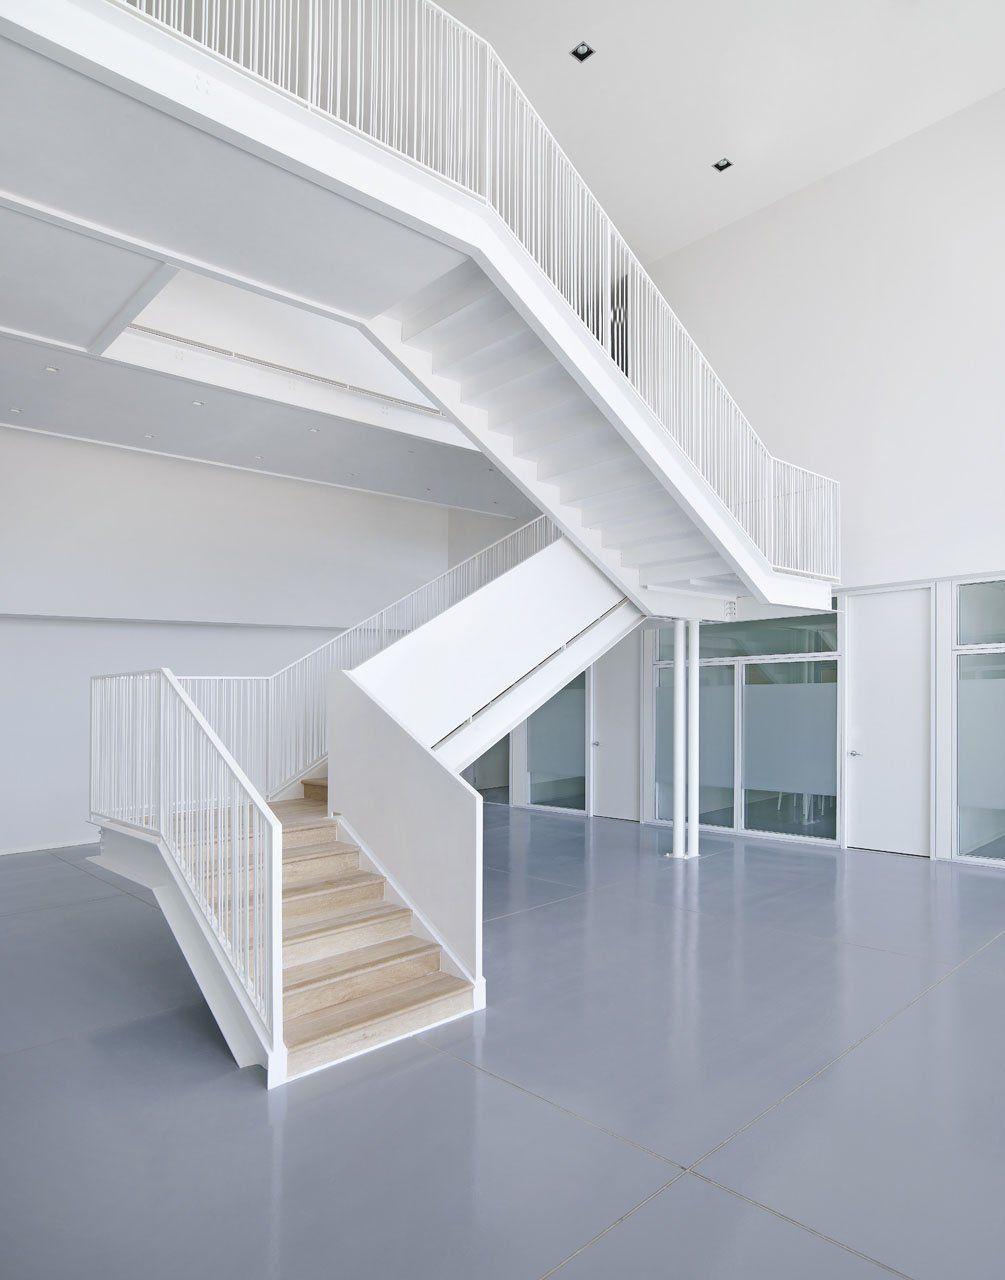 Best Metal Pan Stair 階段のデザイン 階段 螺旋階段 400 x 300